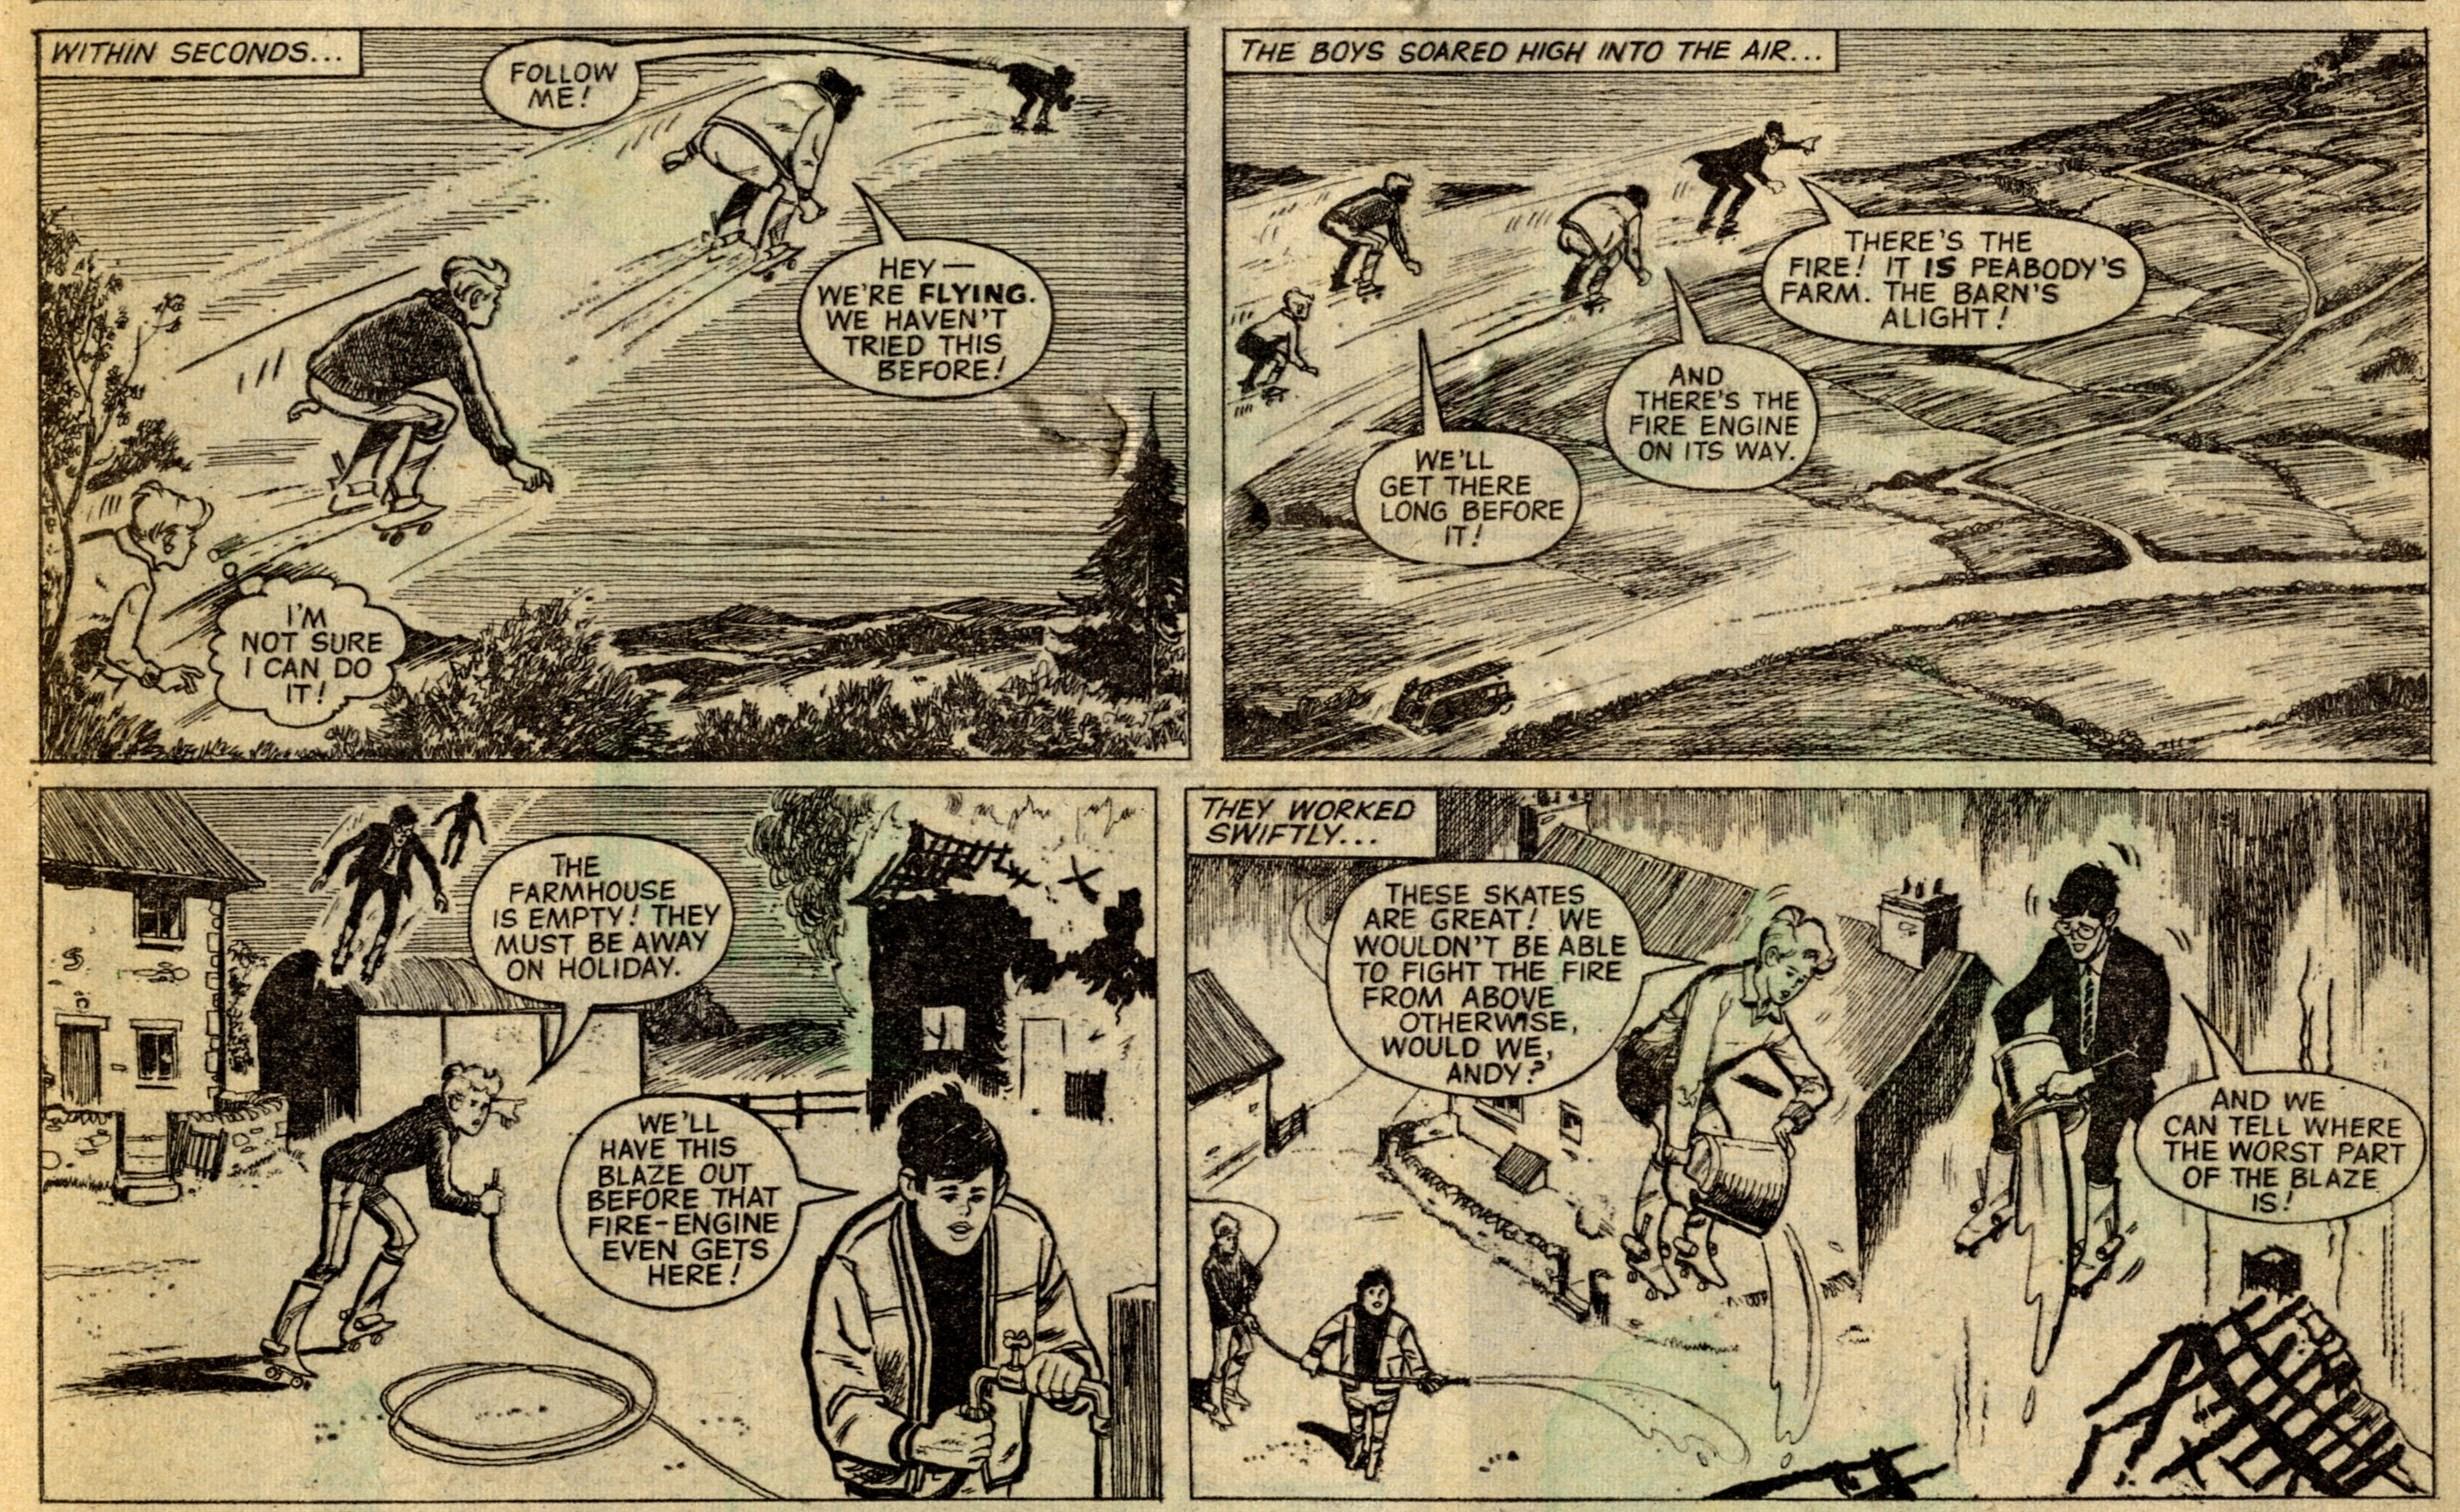 The Jet-skaters: Geoff Jones (artist)